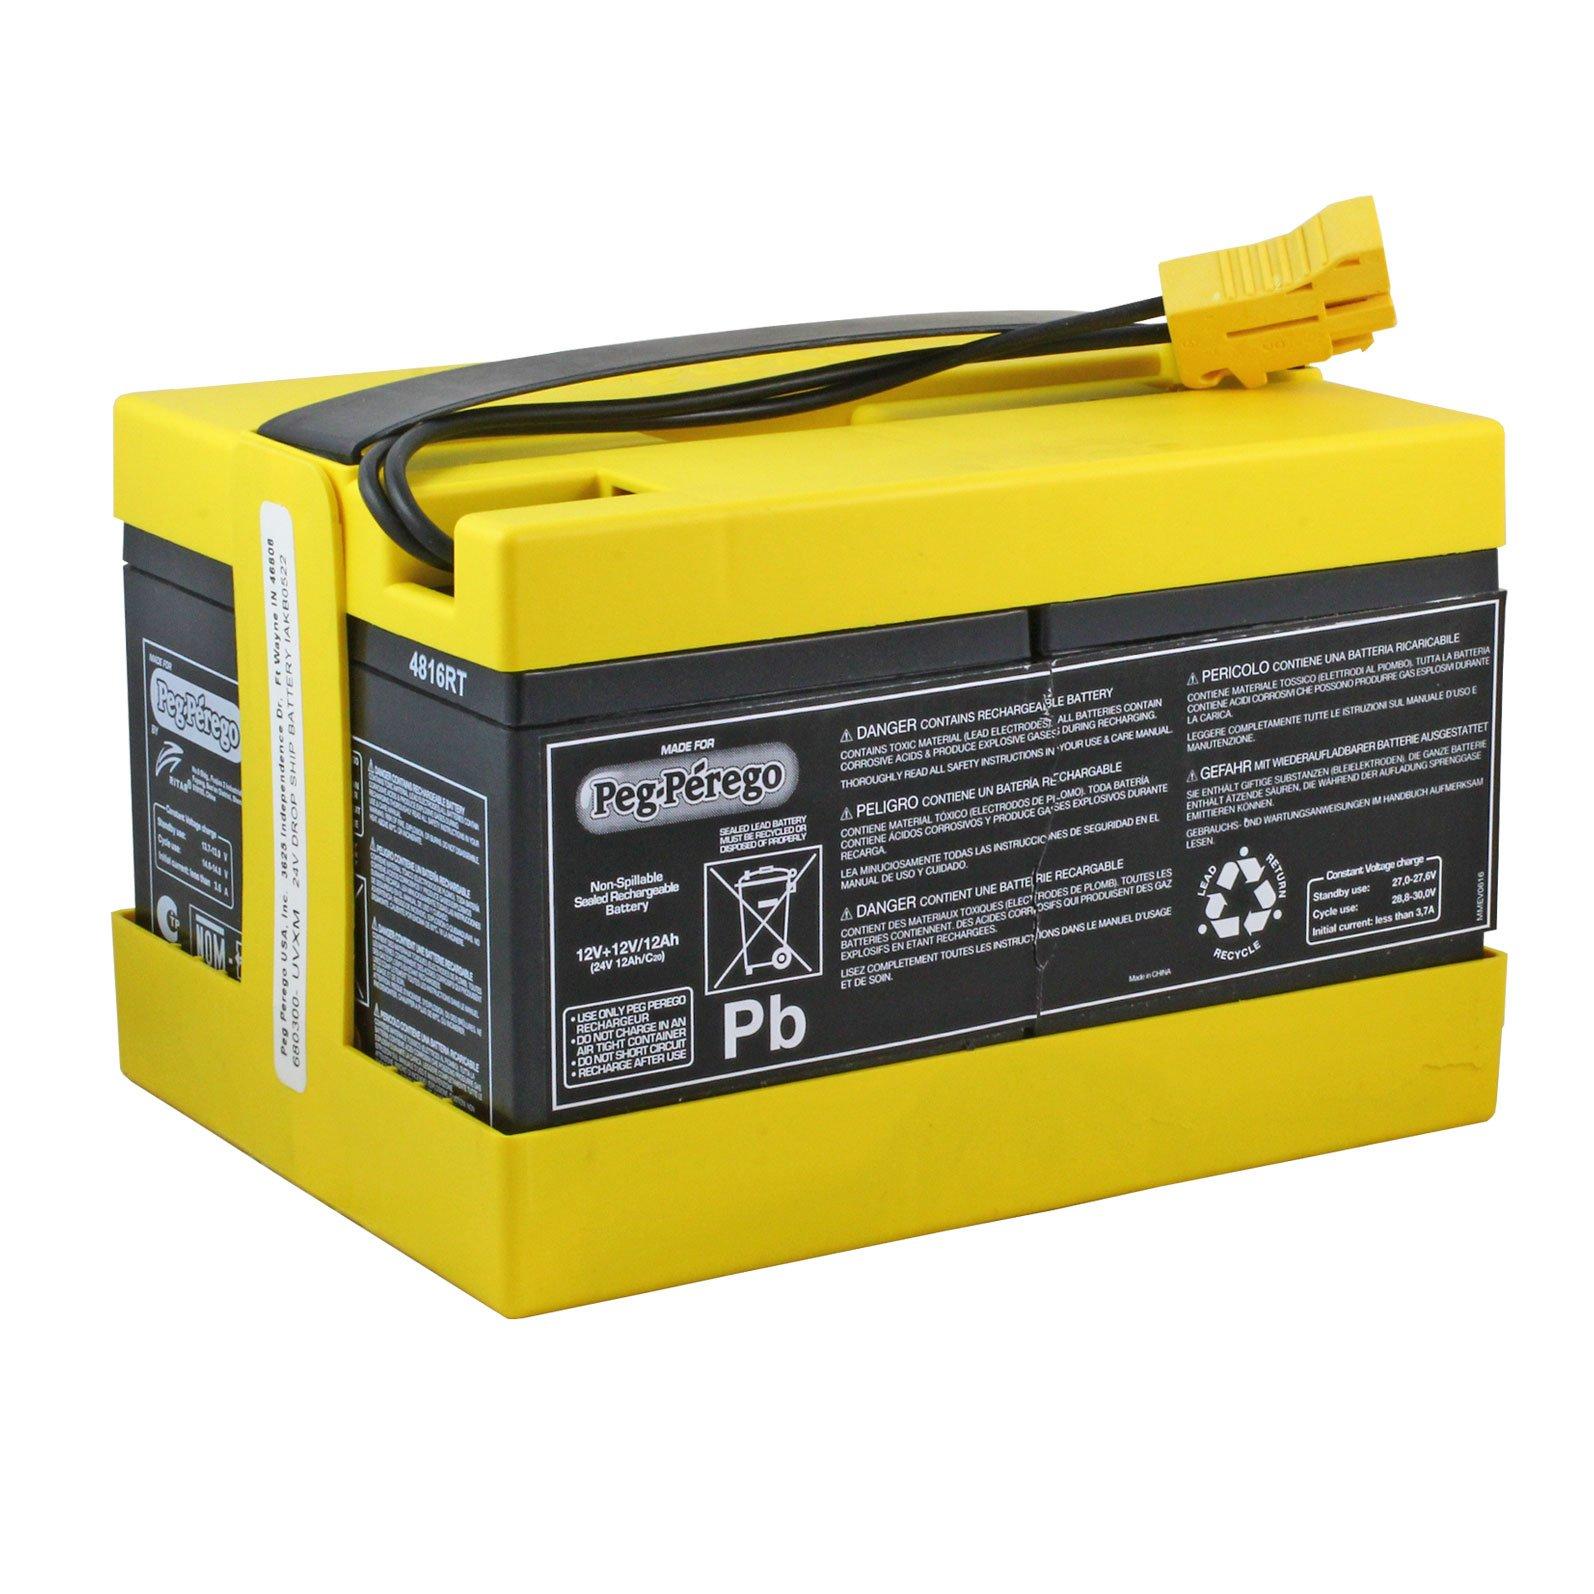 Peg Perego Original 24 Volt Yellow Battery Batterymart Com